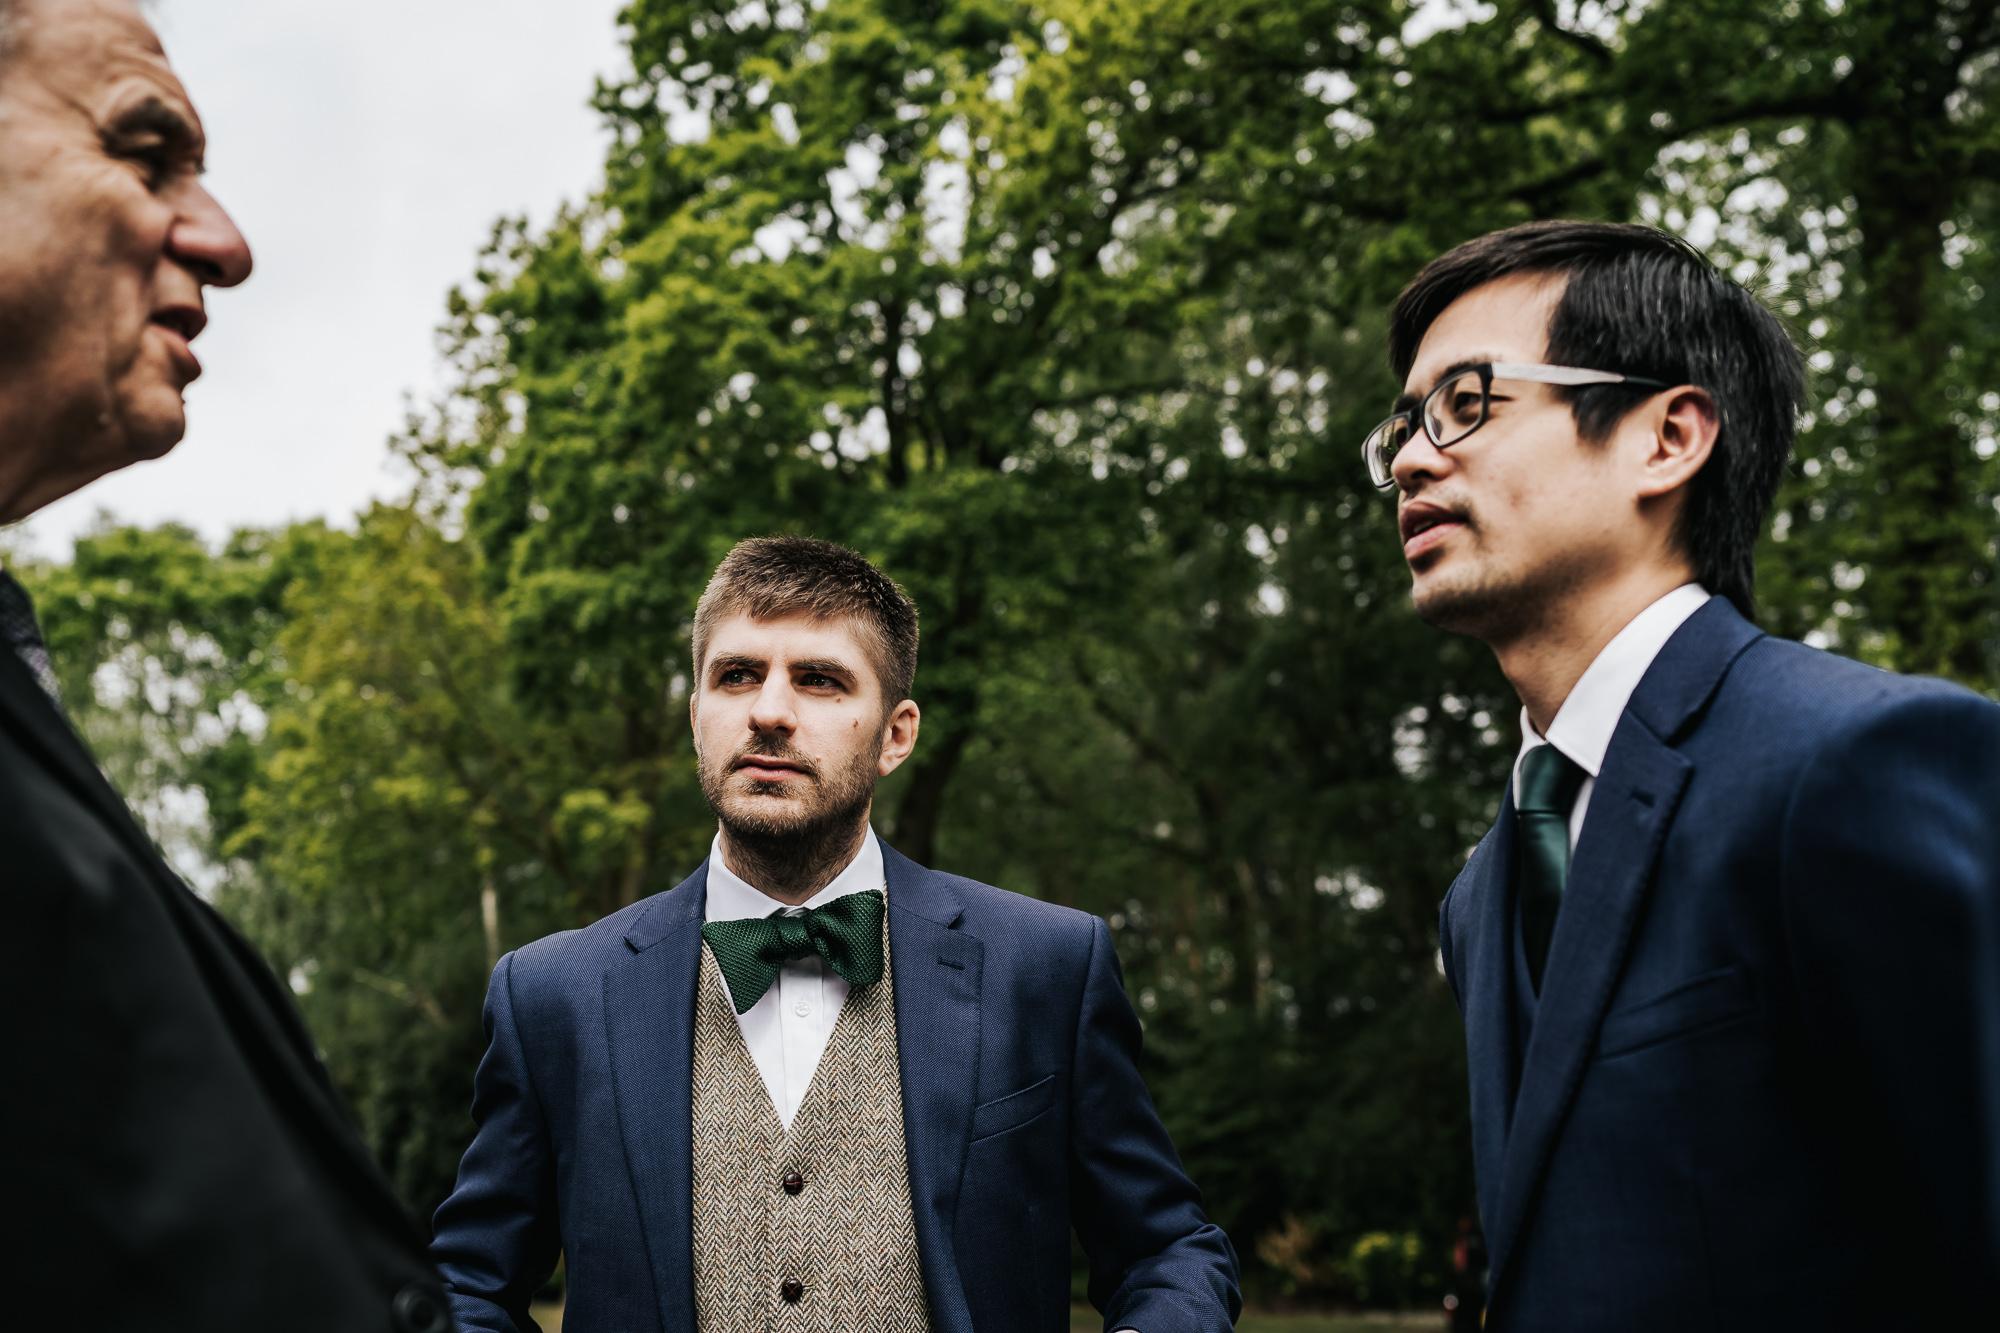 Nunsmere Hall Hotel Wedding photograhpy in cheshire wedding photographer (7 of 42).jpg